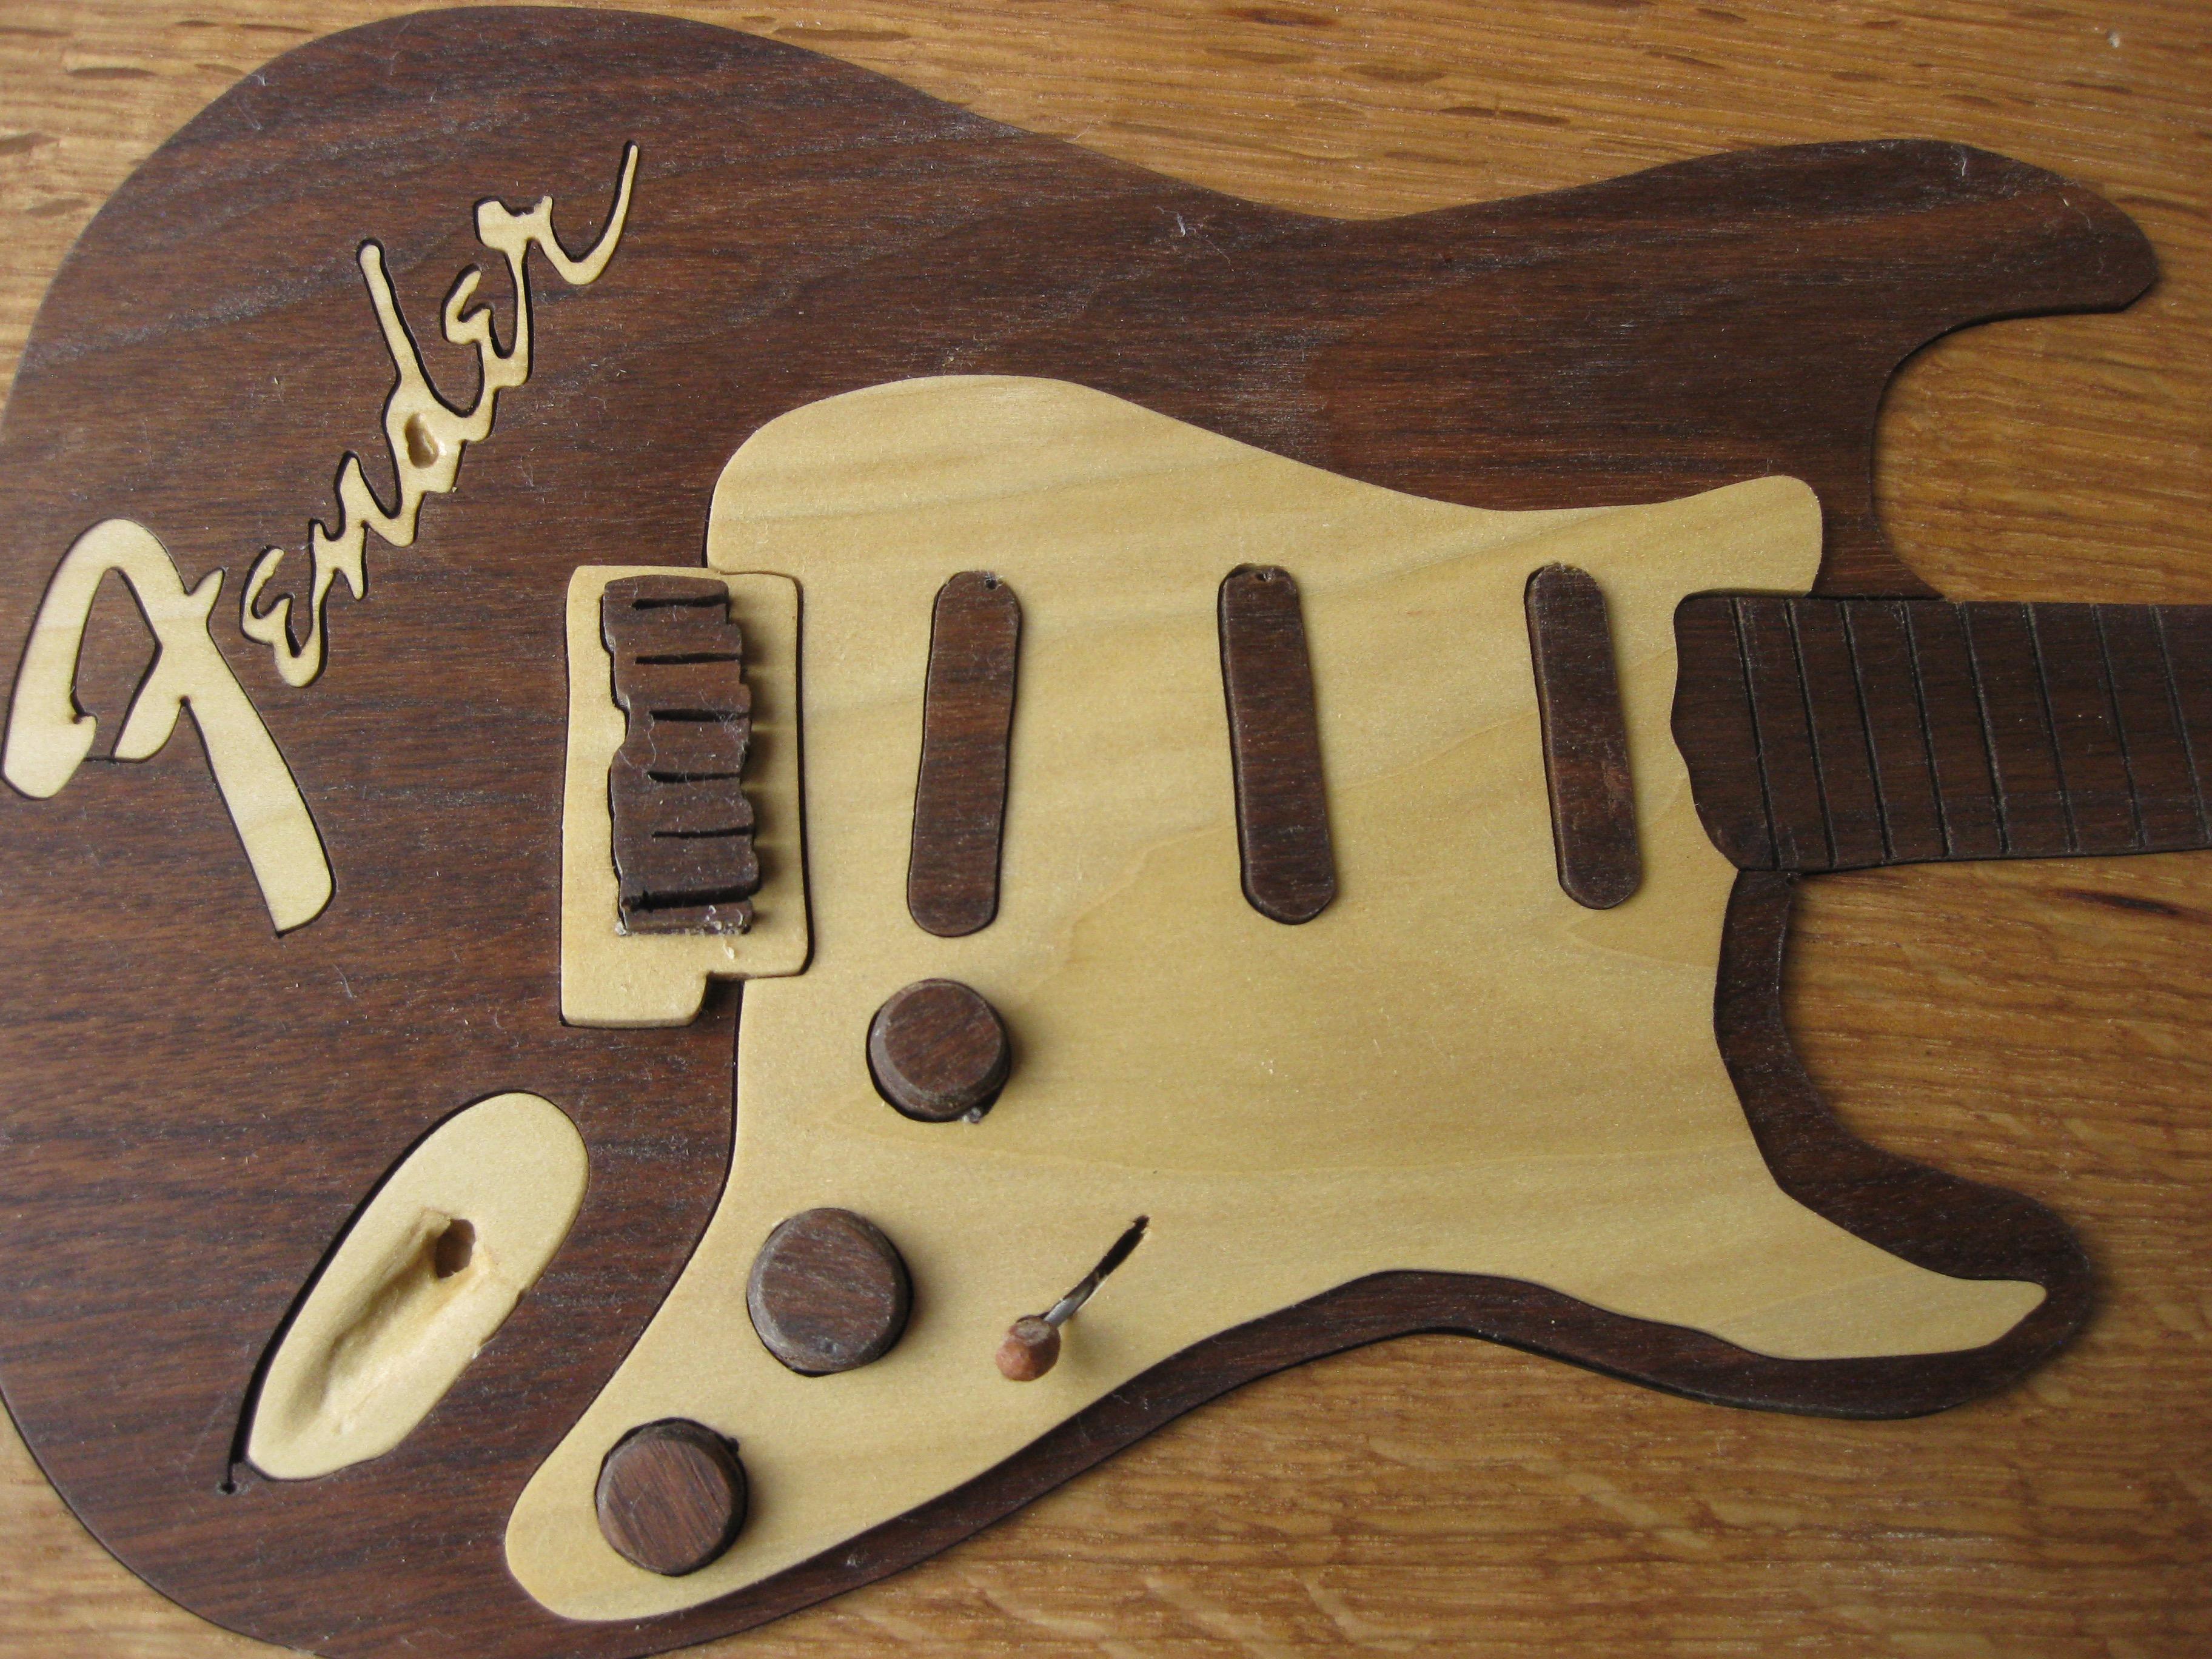 body of Fender Guitar Art Puzzle